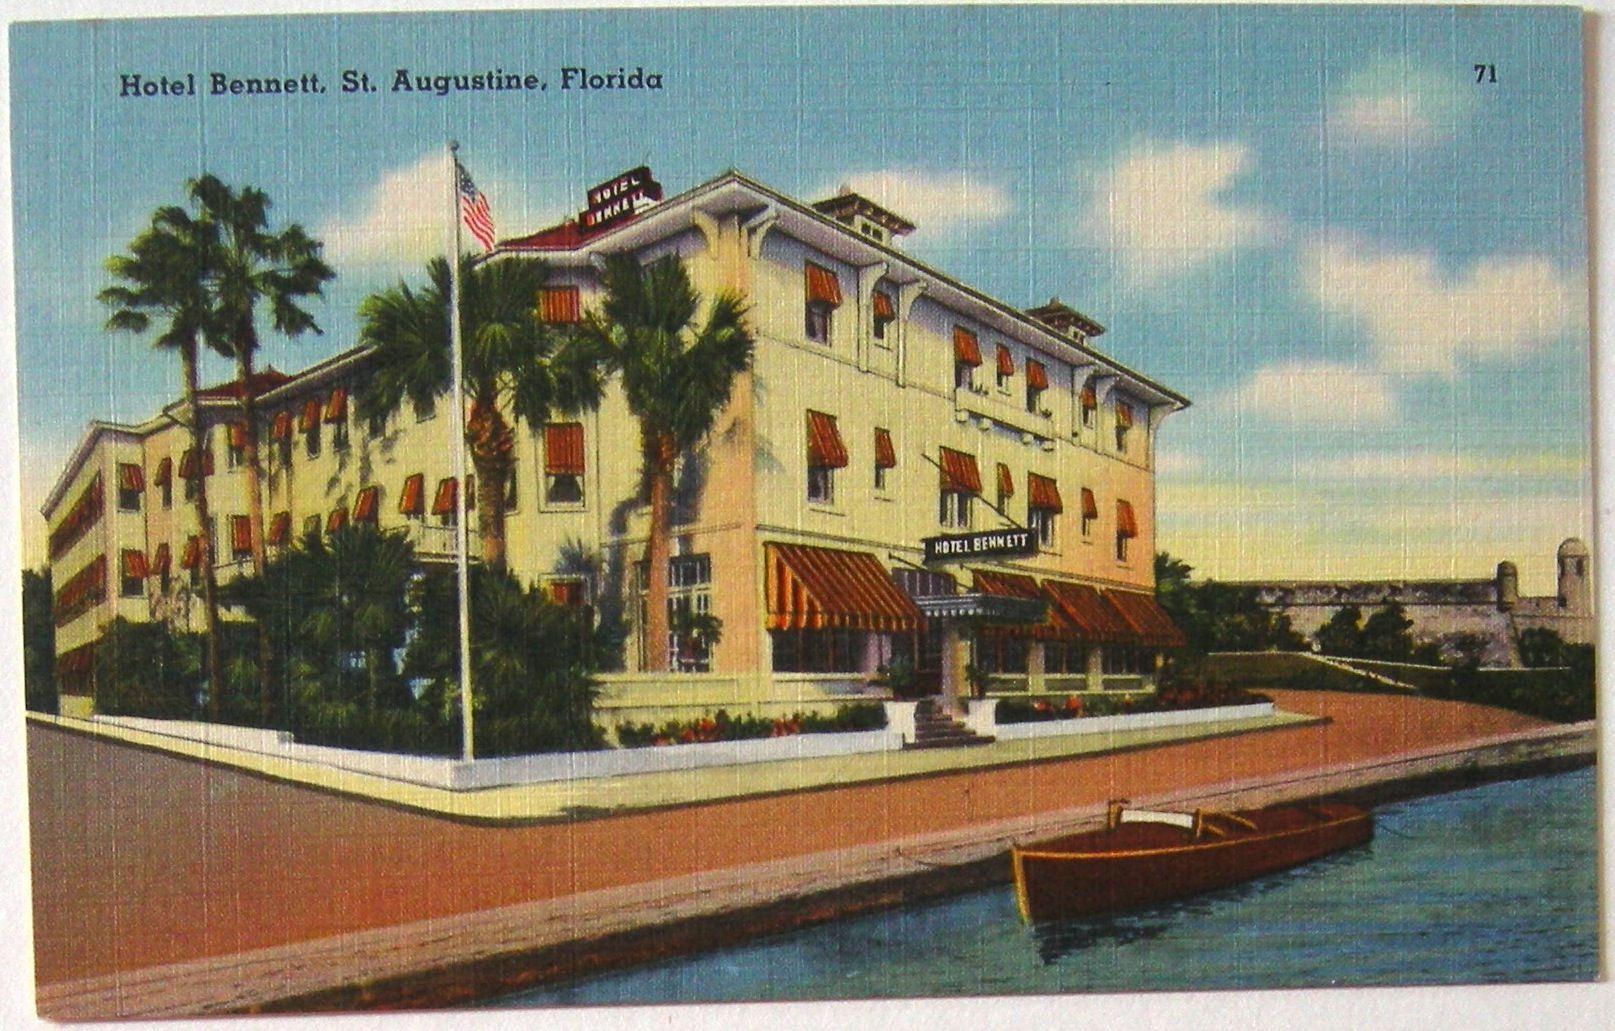 Hotel Bennett, lost place of St. Augustine, FL. No message.